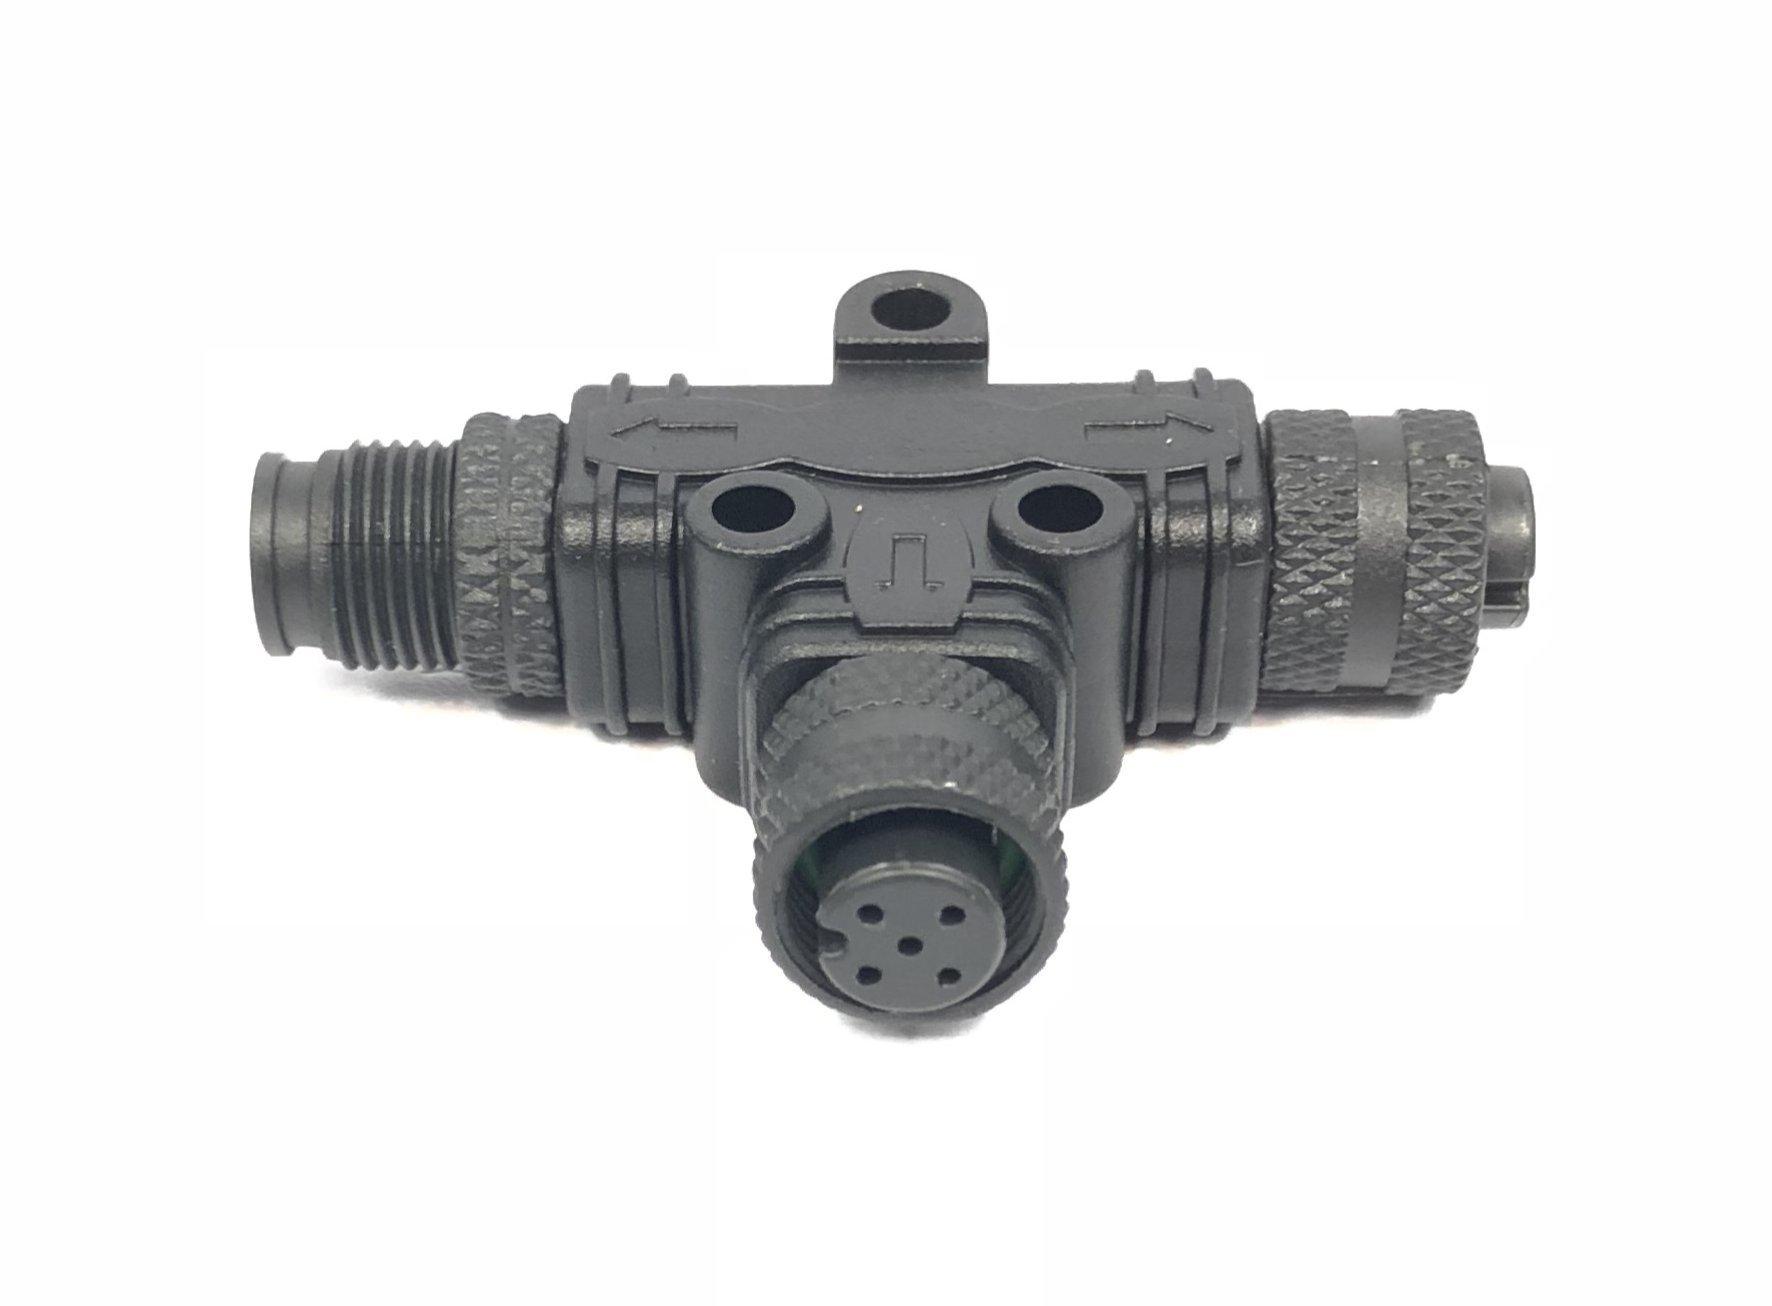 Fox Marine NMEA 2000 (N2k) Compatible T-Connector